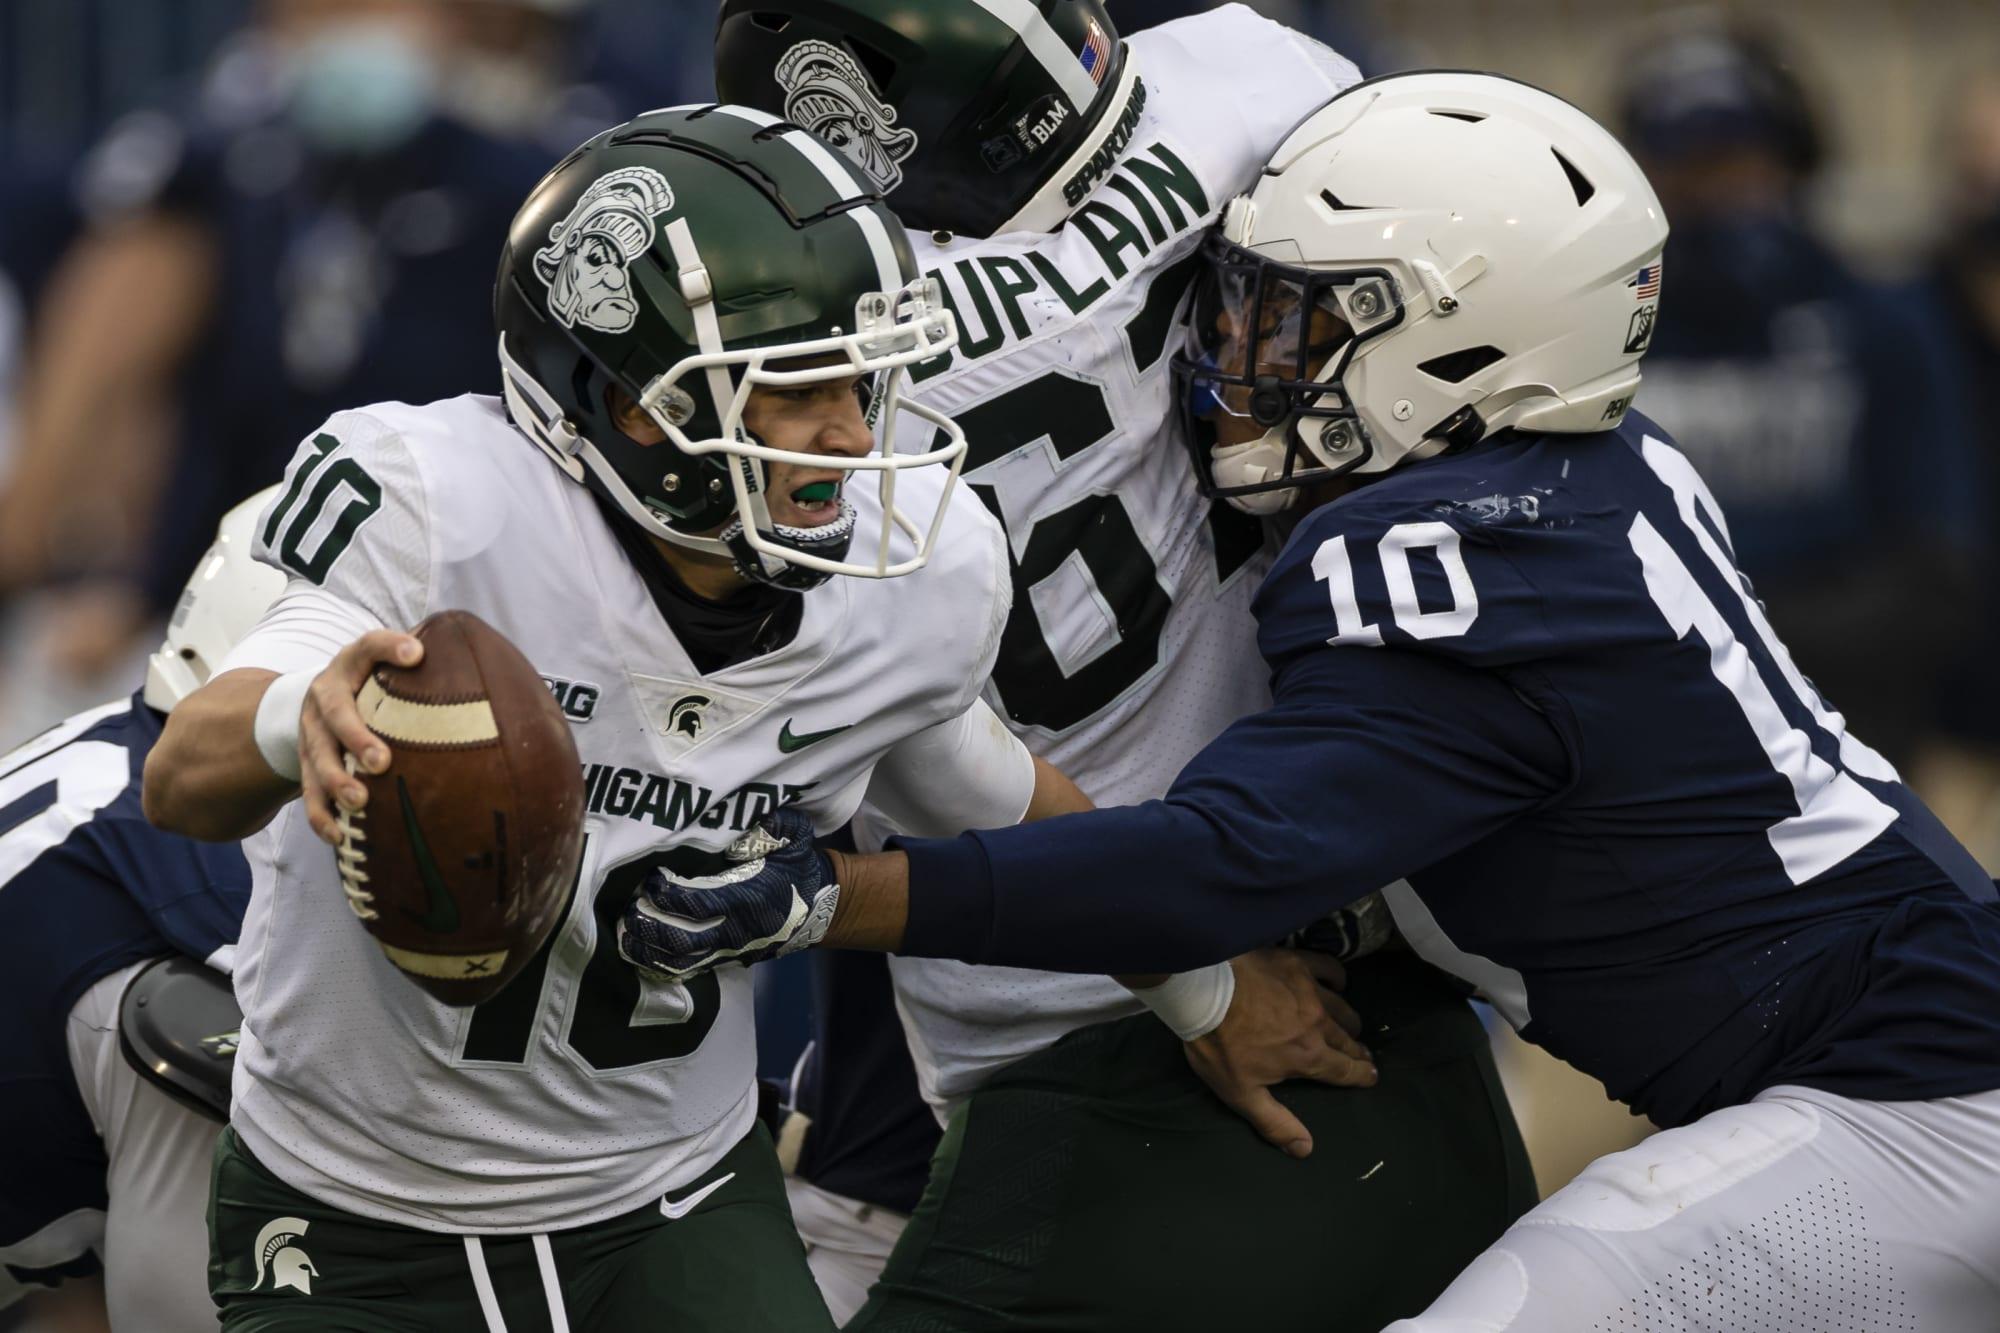 Transfer portal rumors: Penn State Football's Lance Dixon to Big Ten rival?